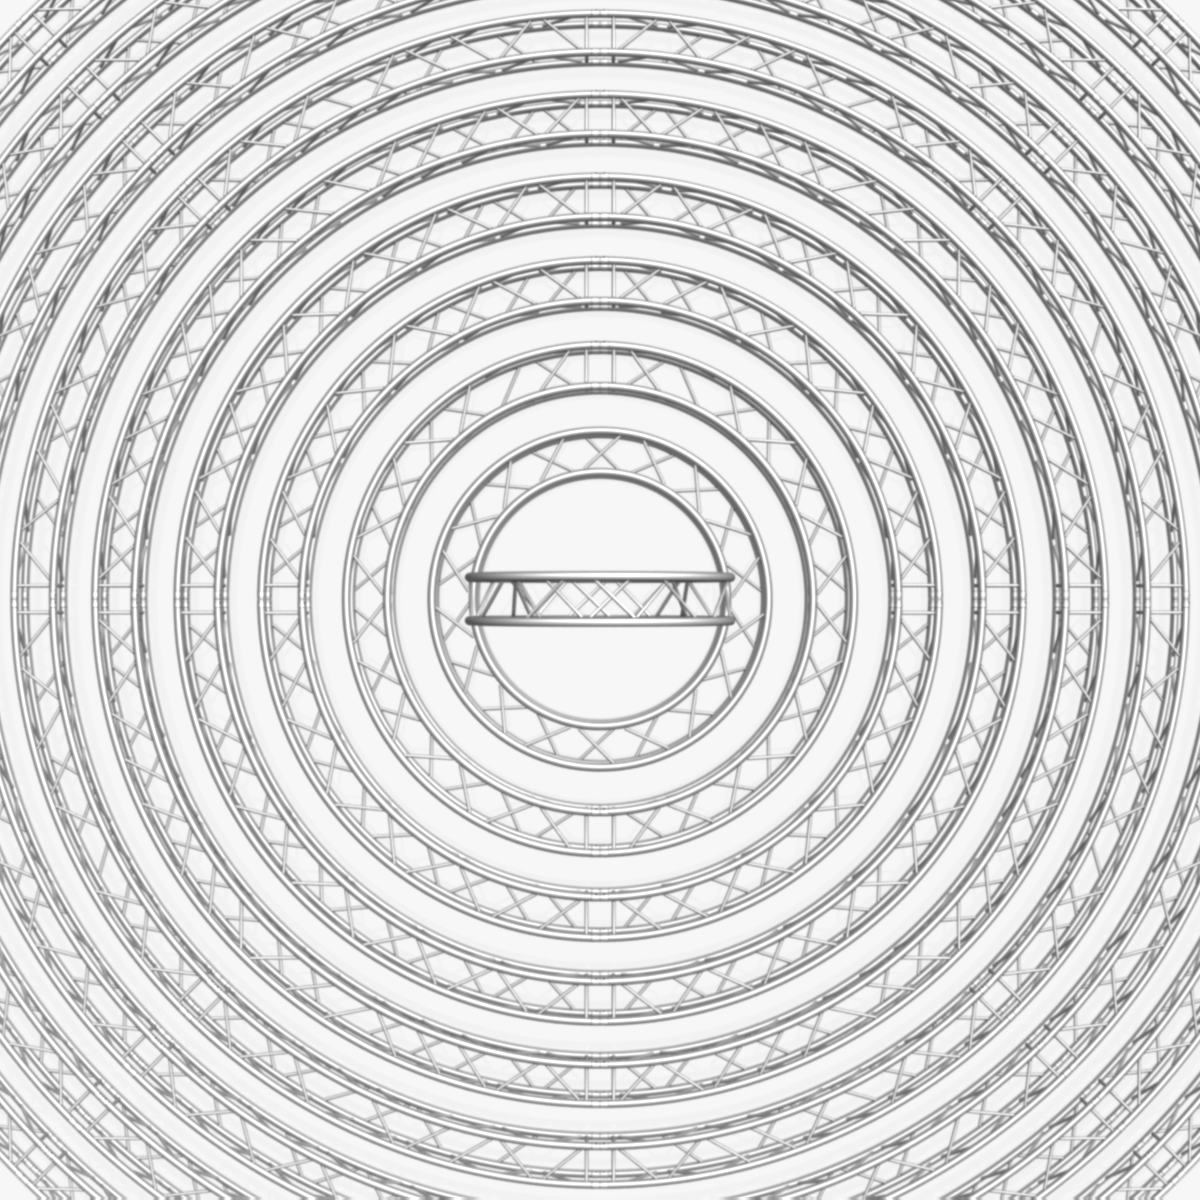 circle square truss modular collection 3d model 3ds max dxf fbx c4d dae  texture obj 252343